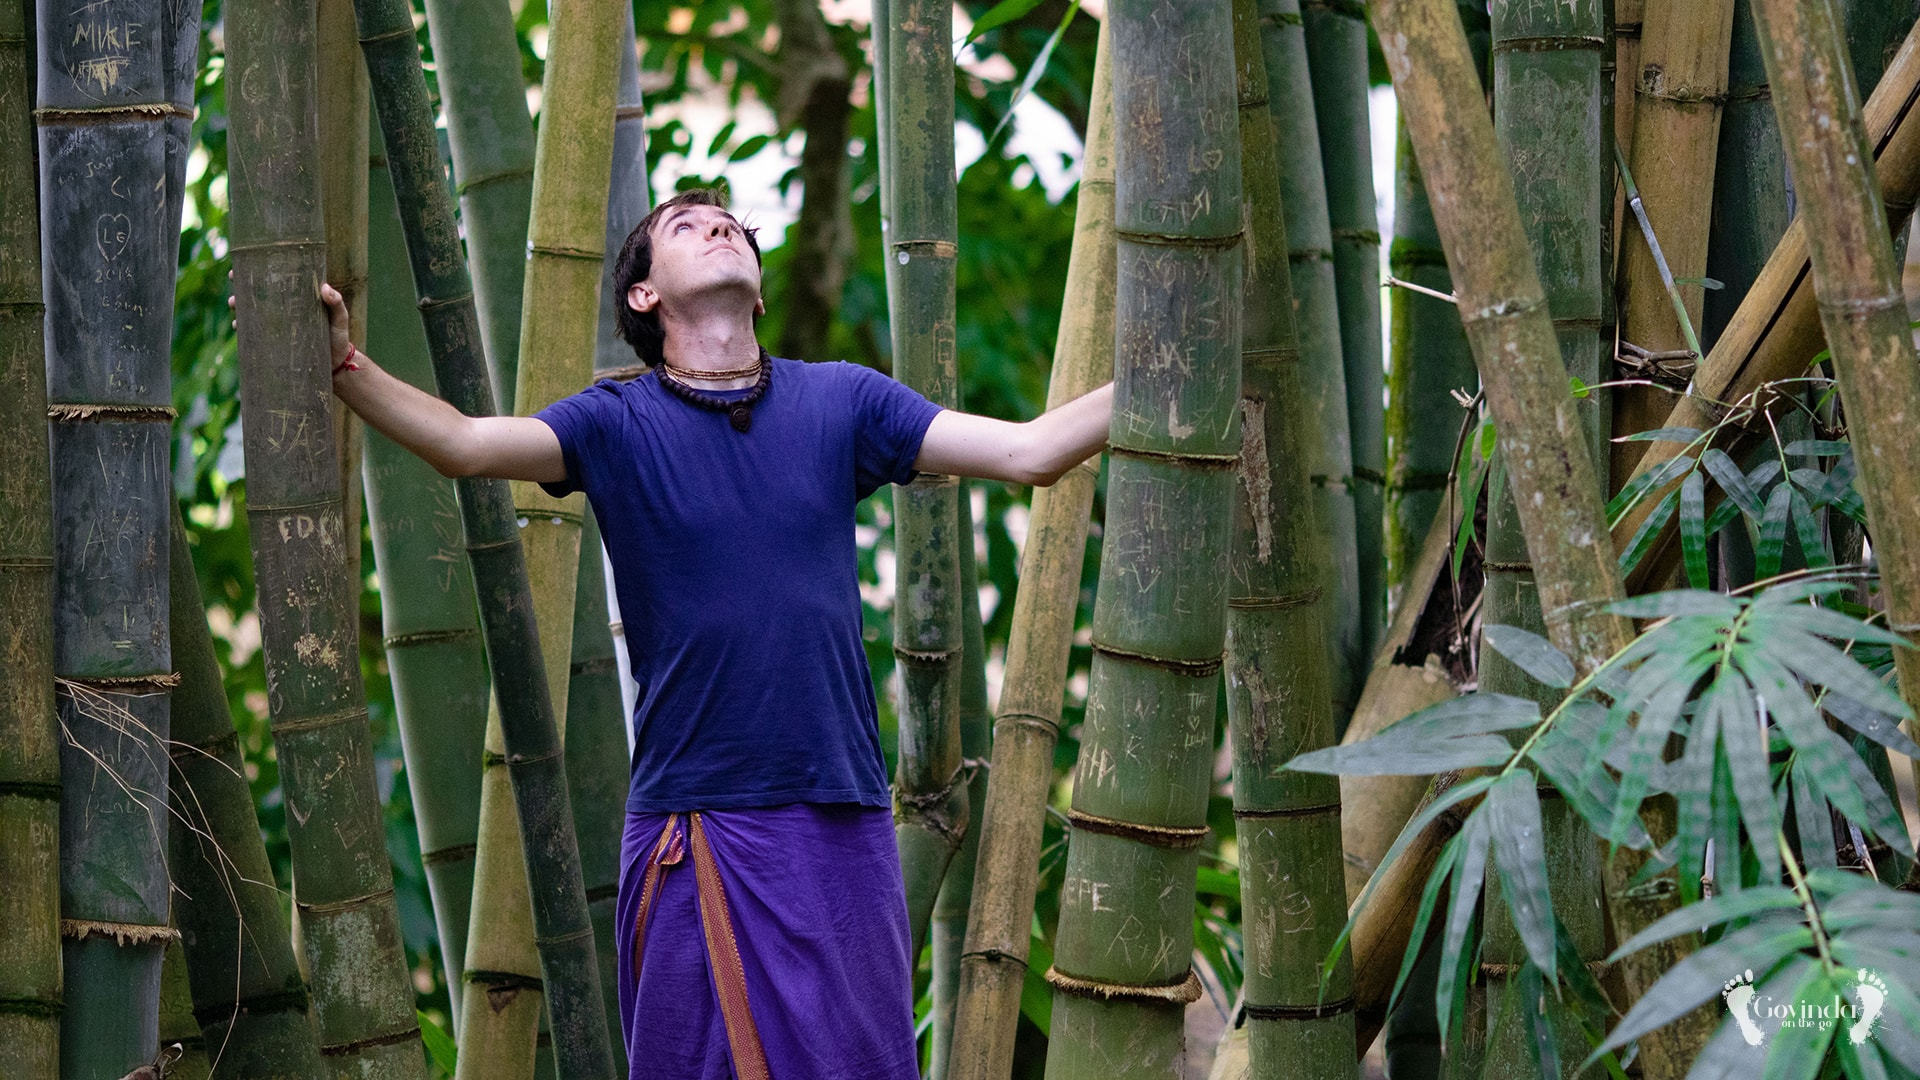 Bamboo trees in Botanical Garden Mauritius